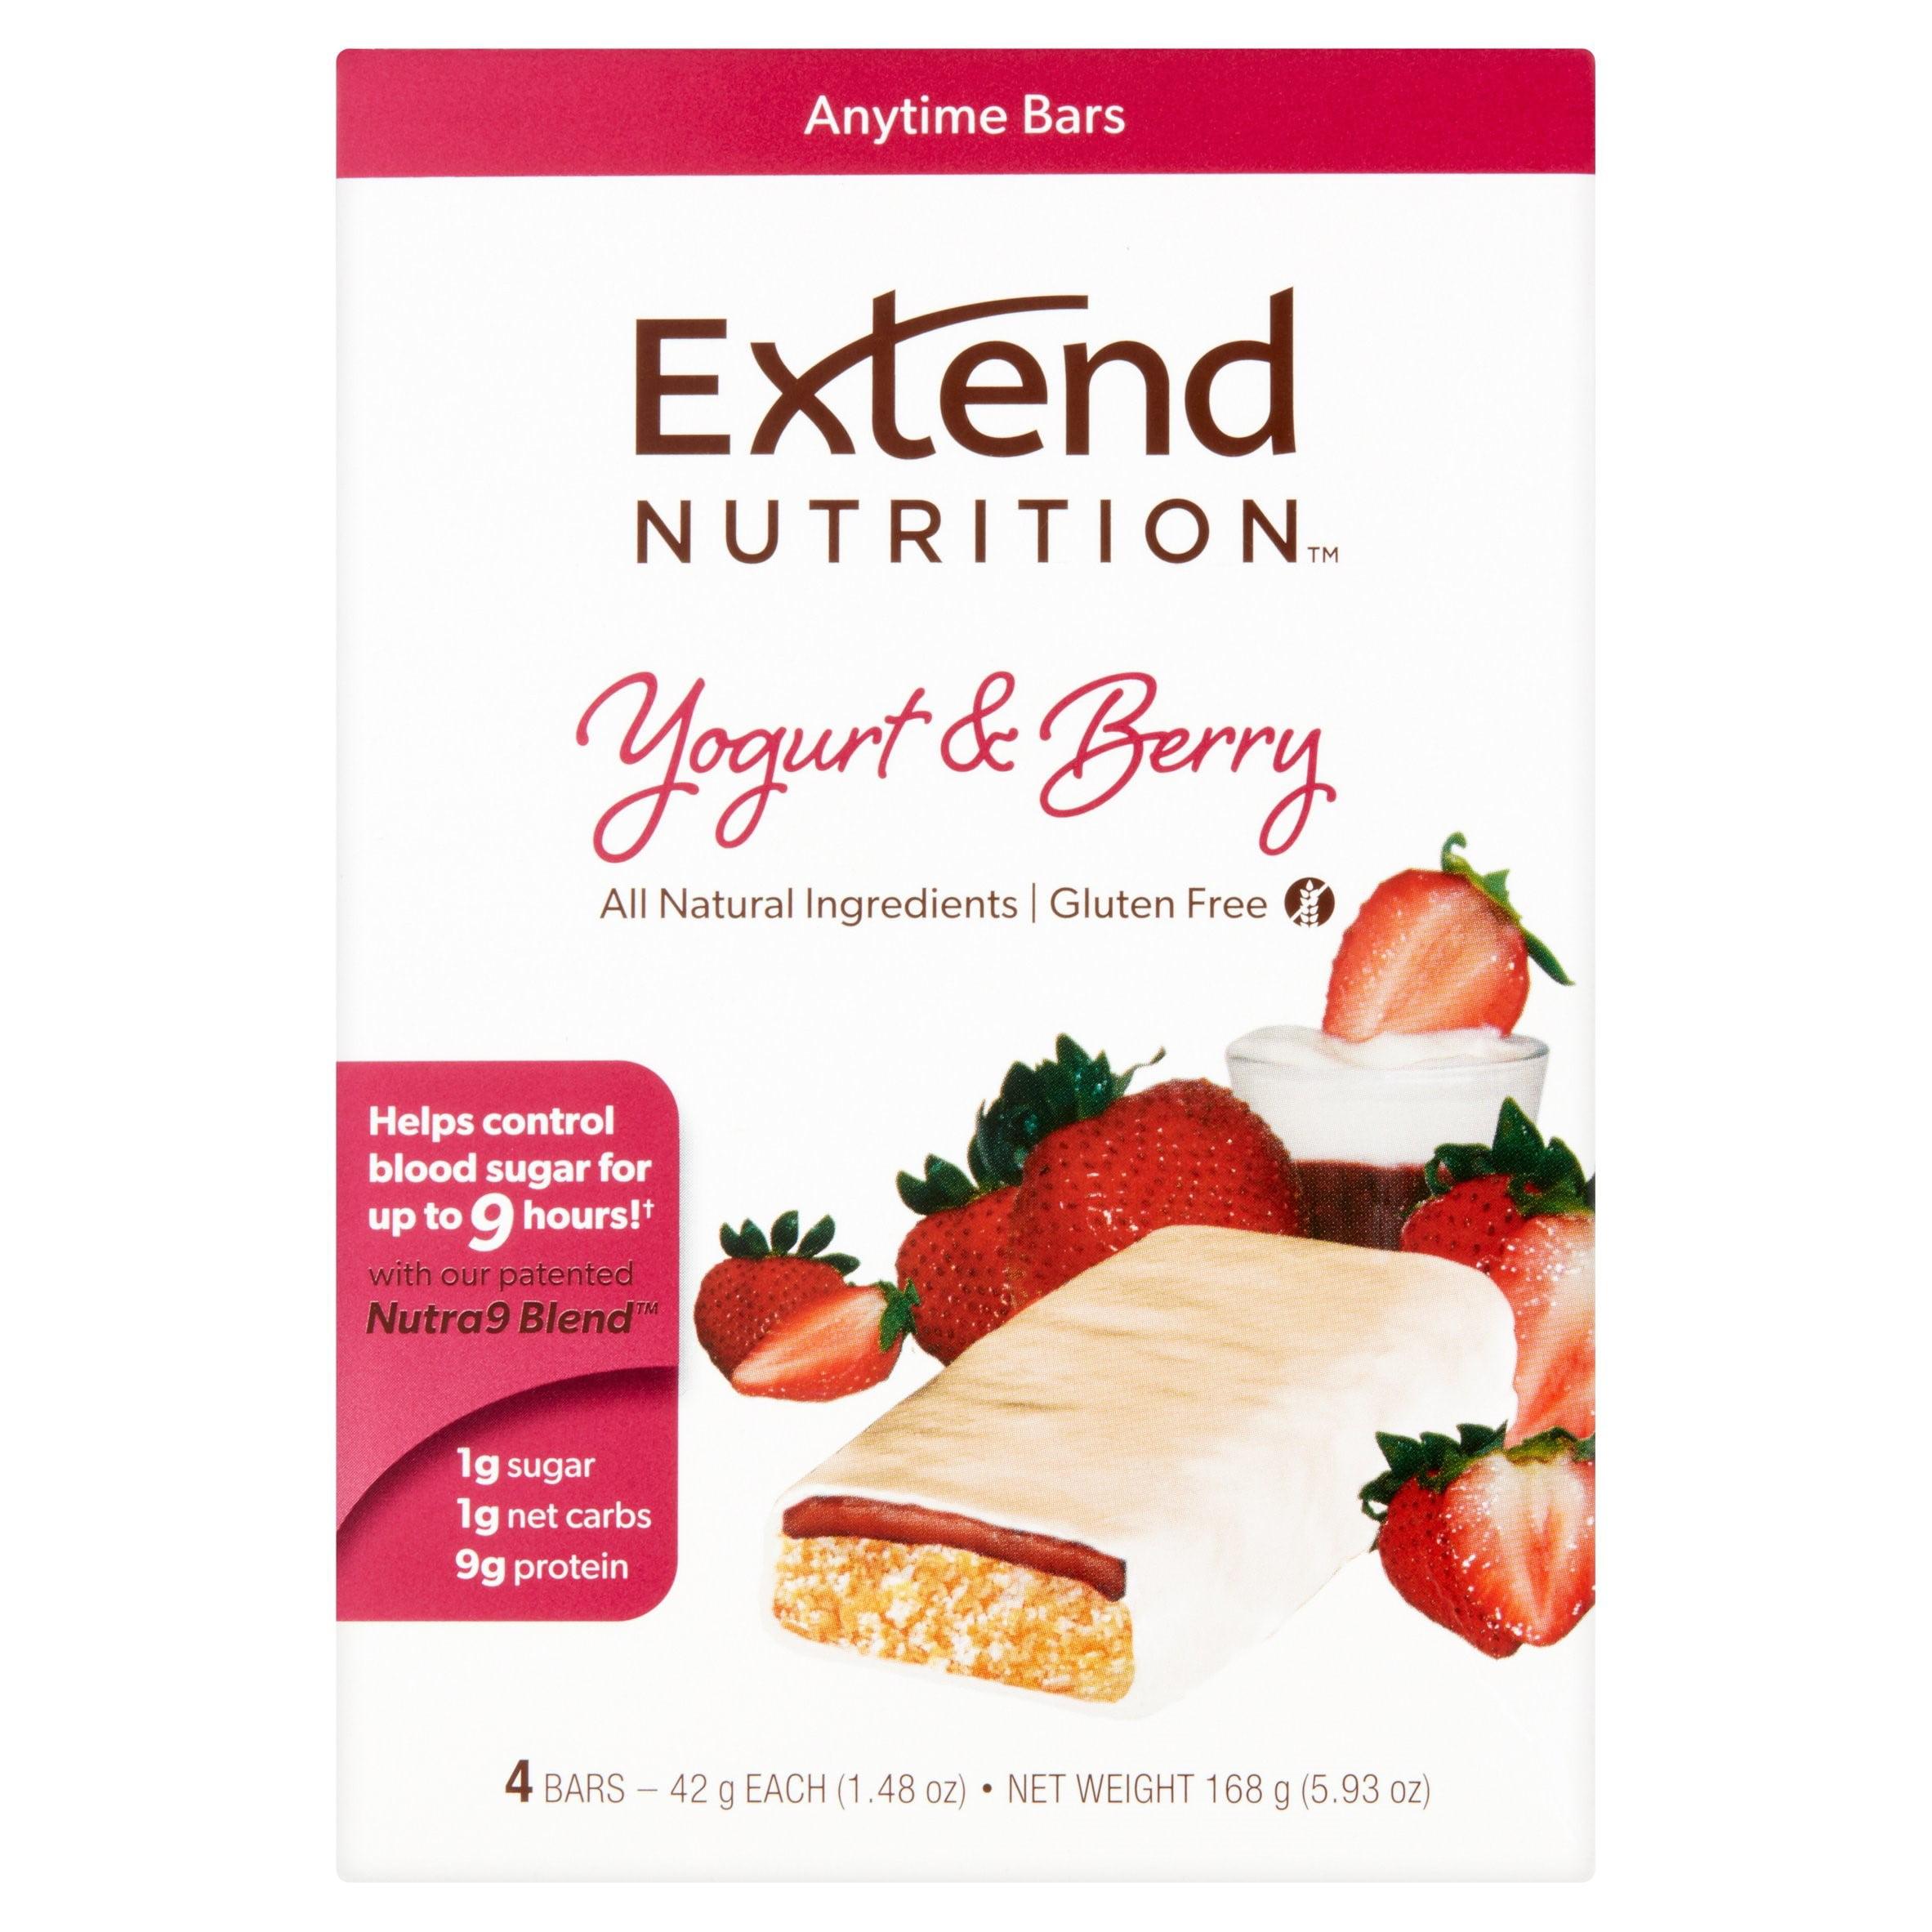 Extend Nutrition Bar, Yogurt & Berry, 9g Protein, 4 Ct